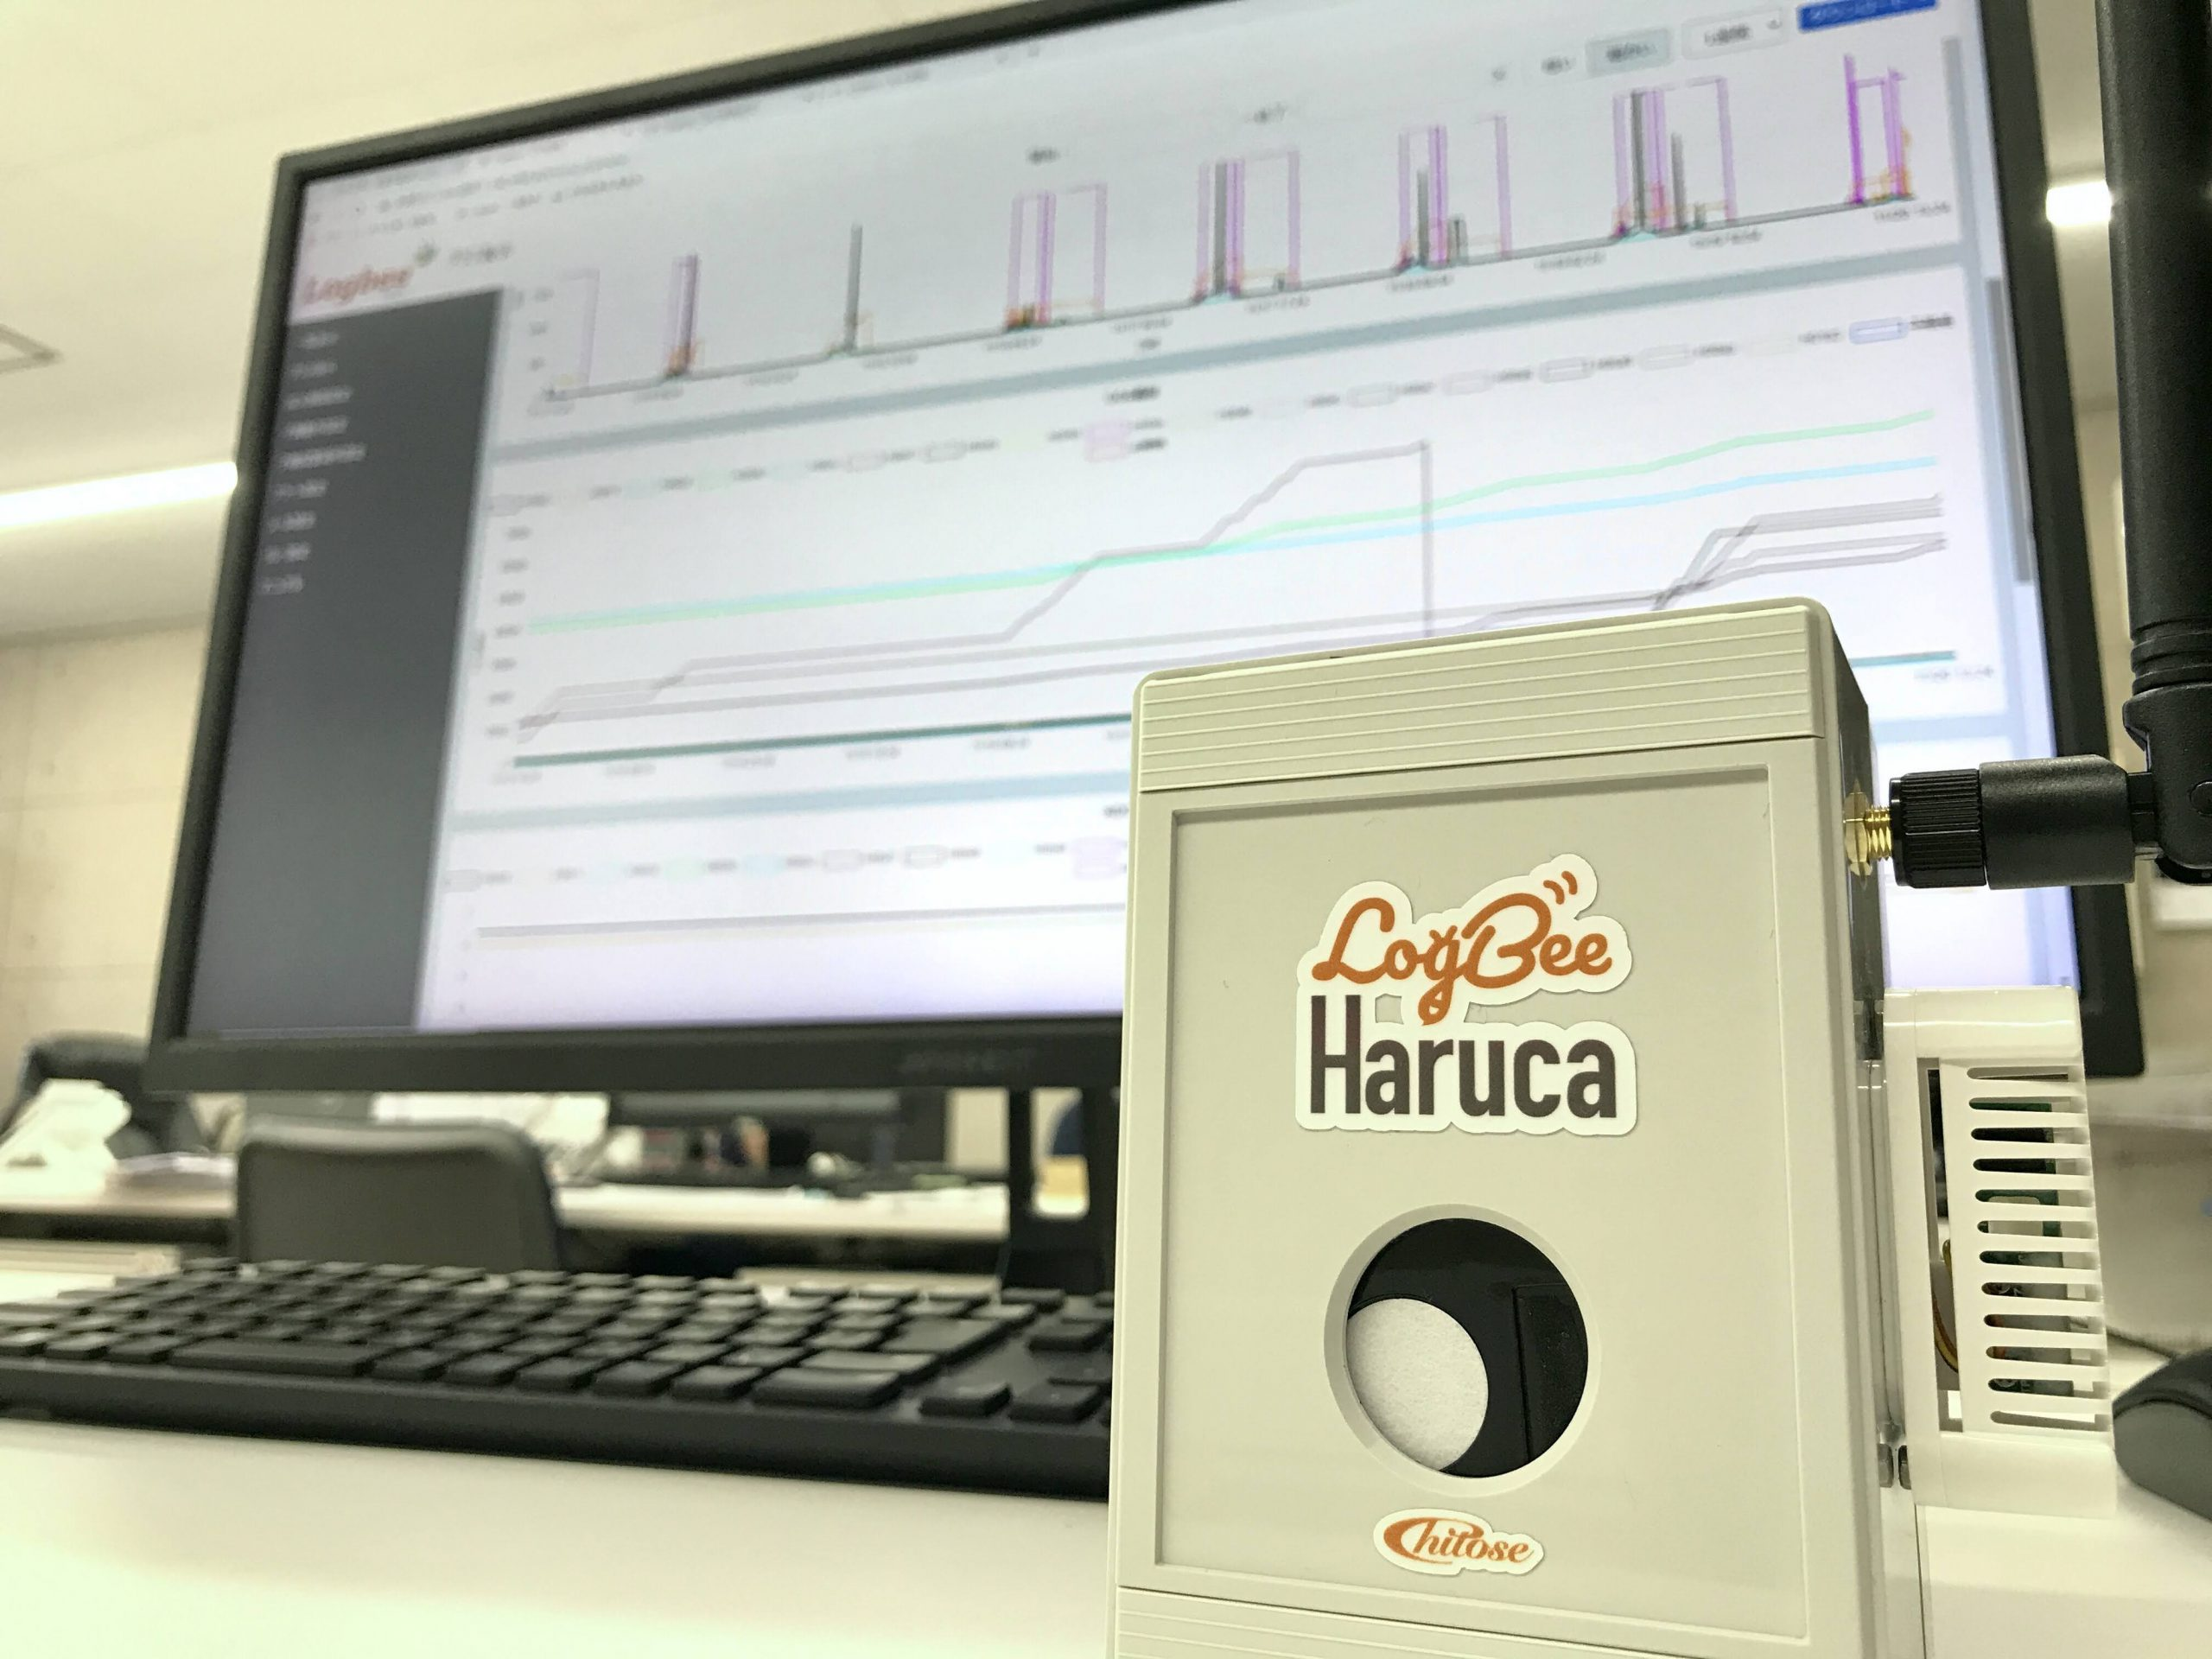 Logbee Haruca CO2で換気の見える化